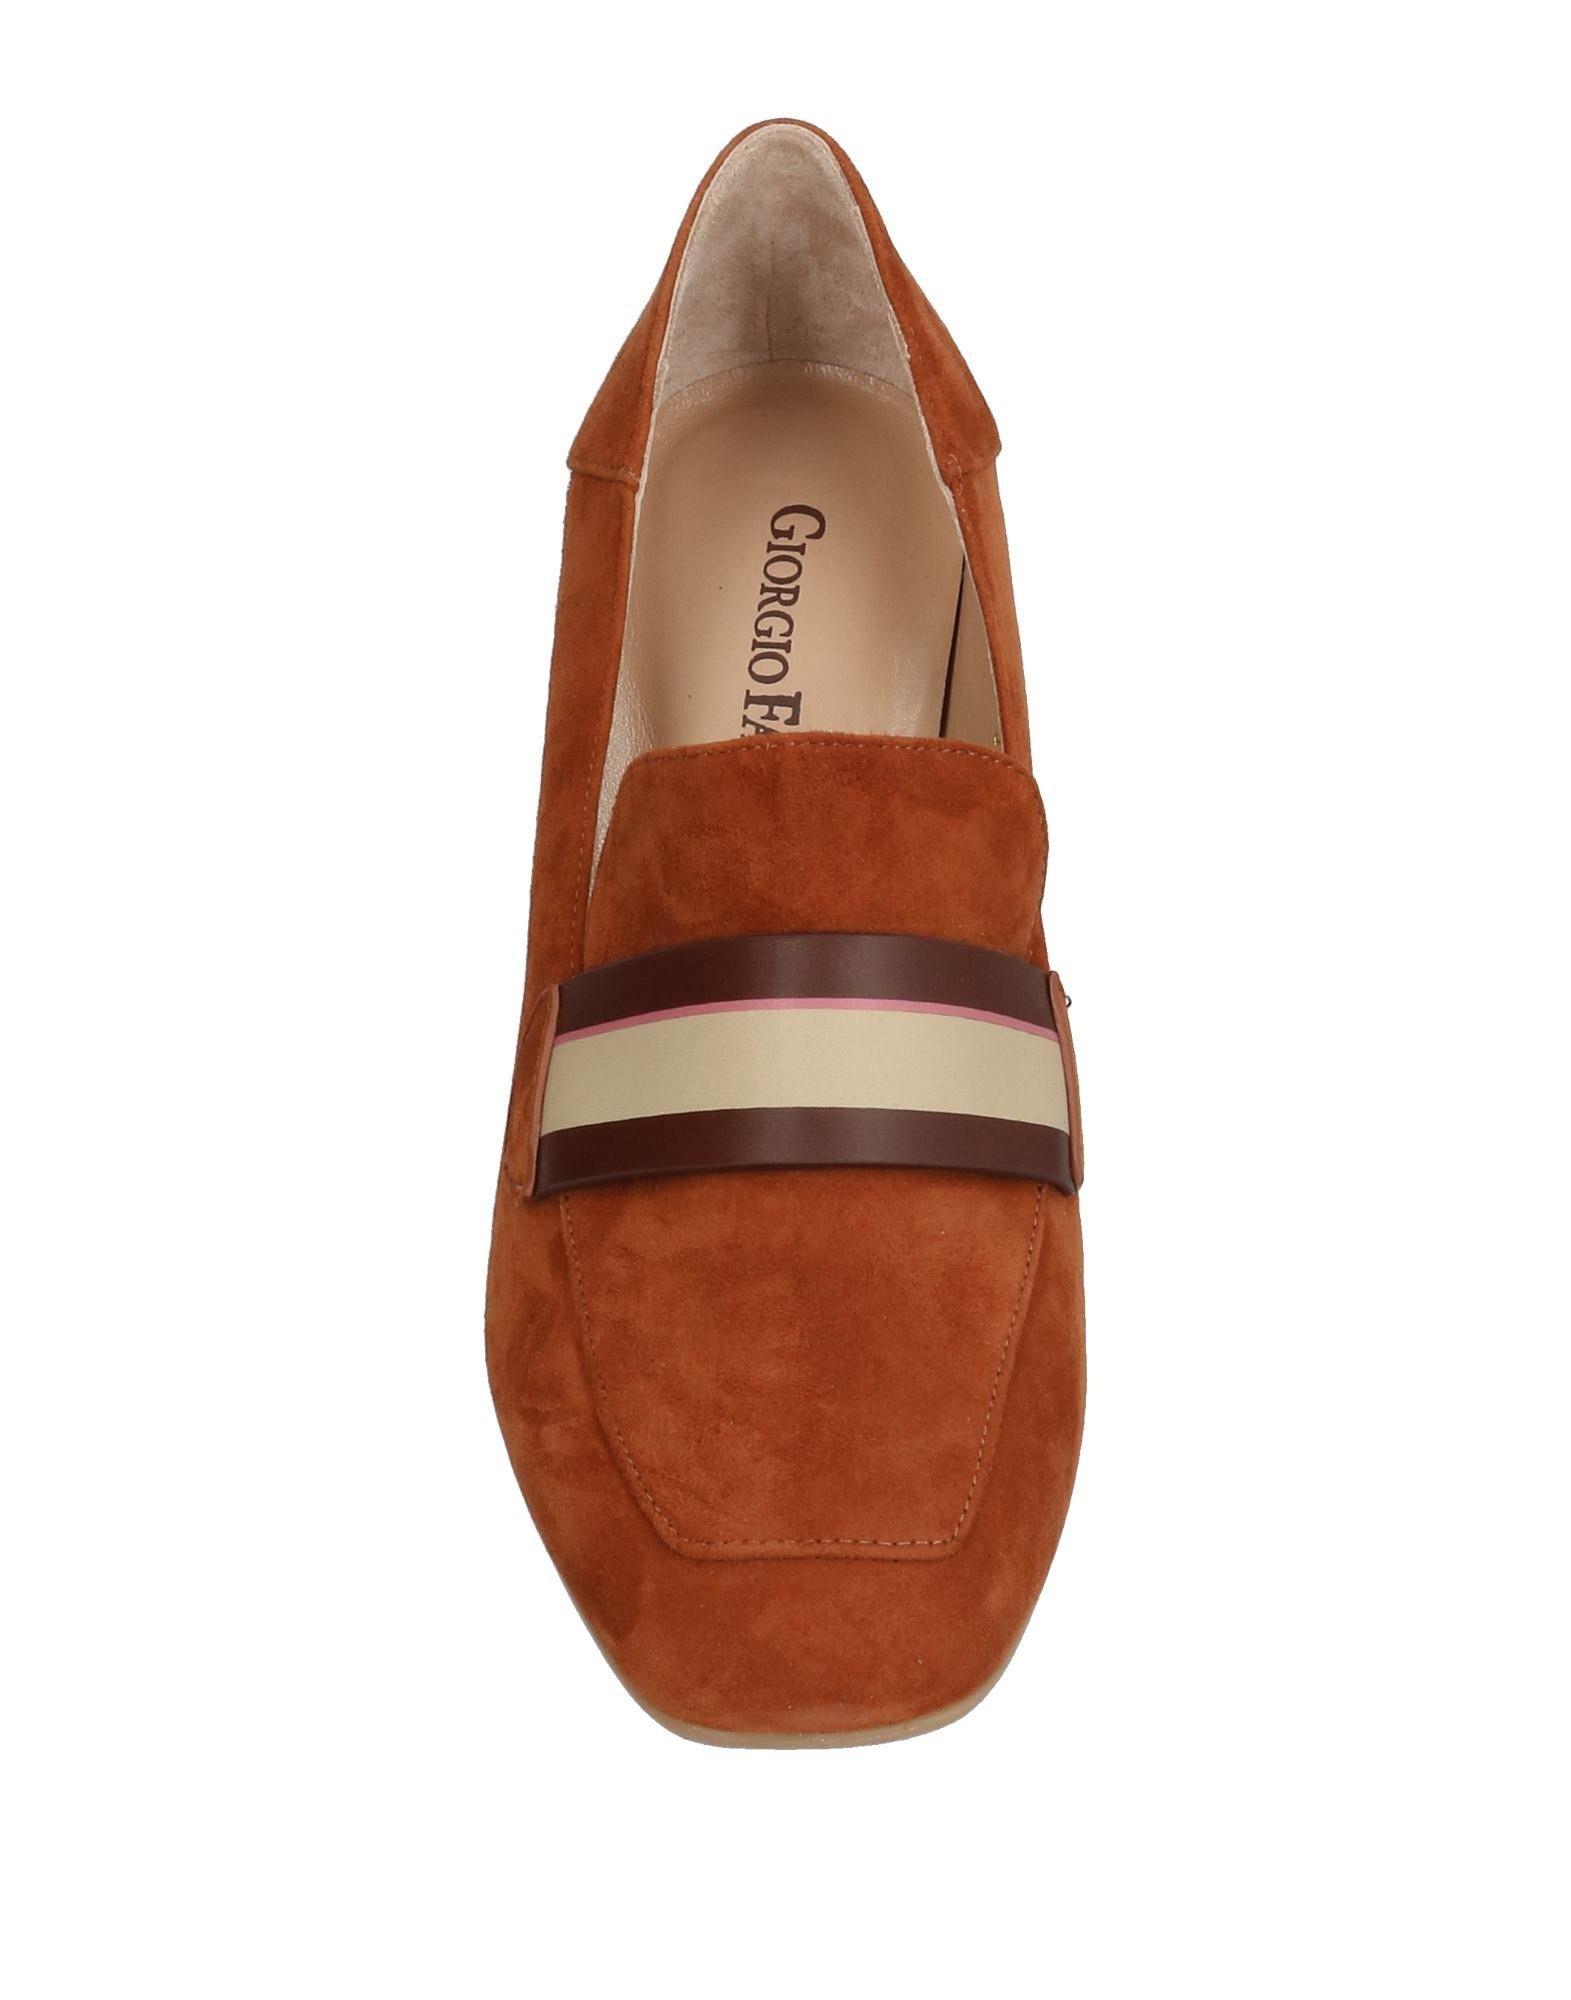 Stilvolle Mokassins billige Schuhe Giorgio Fabiani Mokassins Stilvolle Damen  11332896IL c948d8